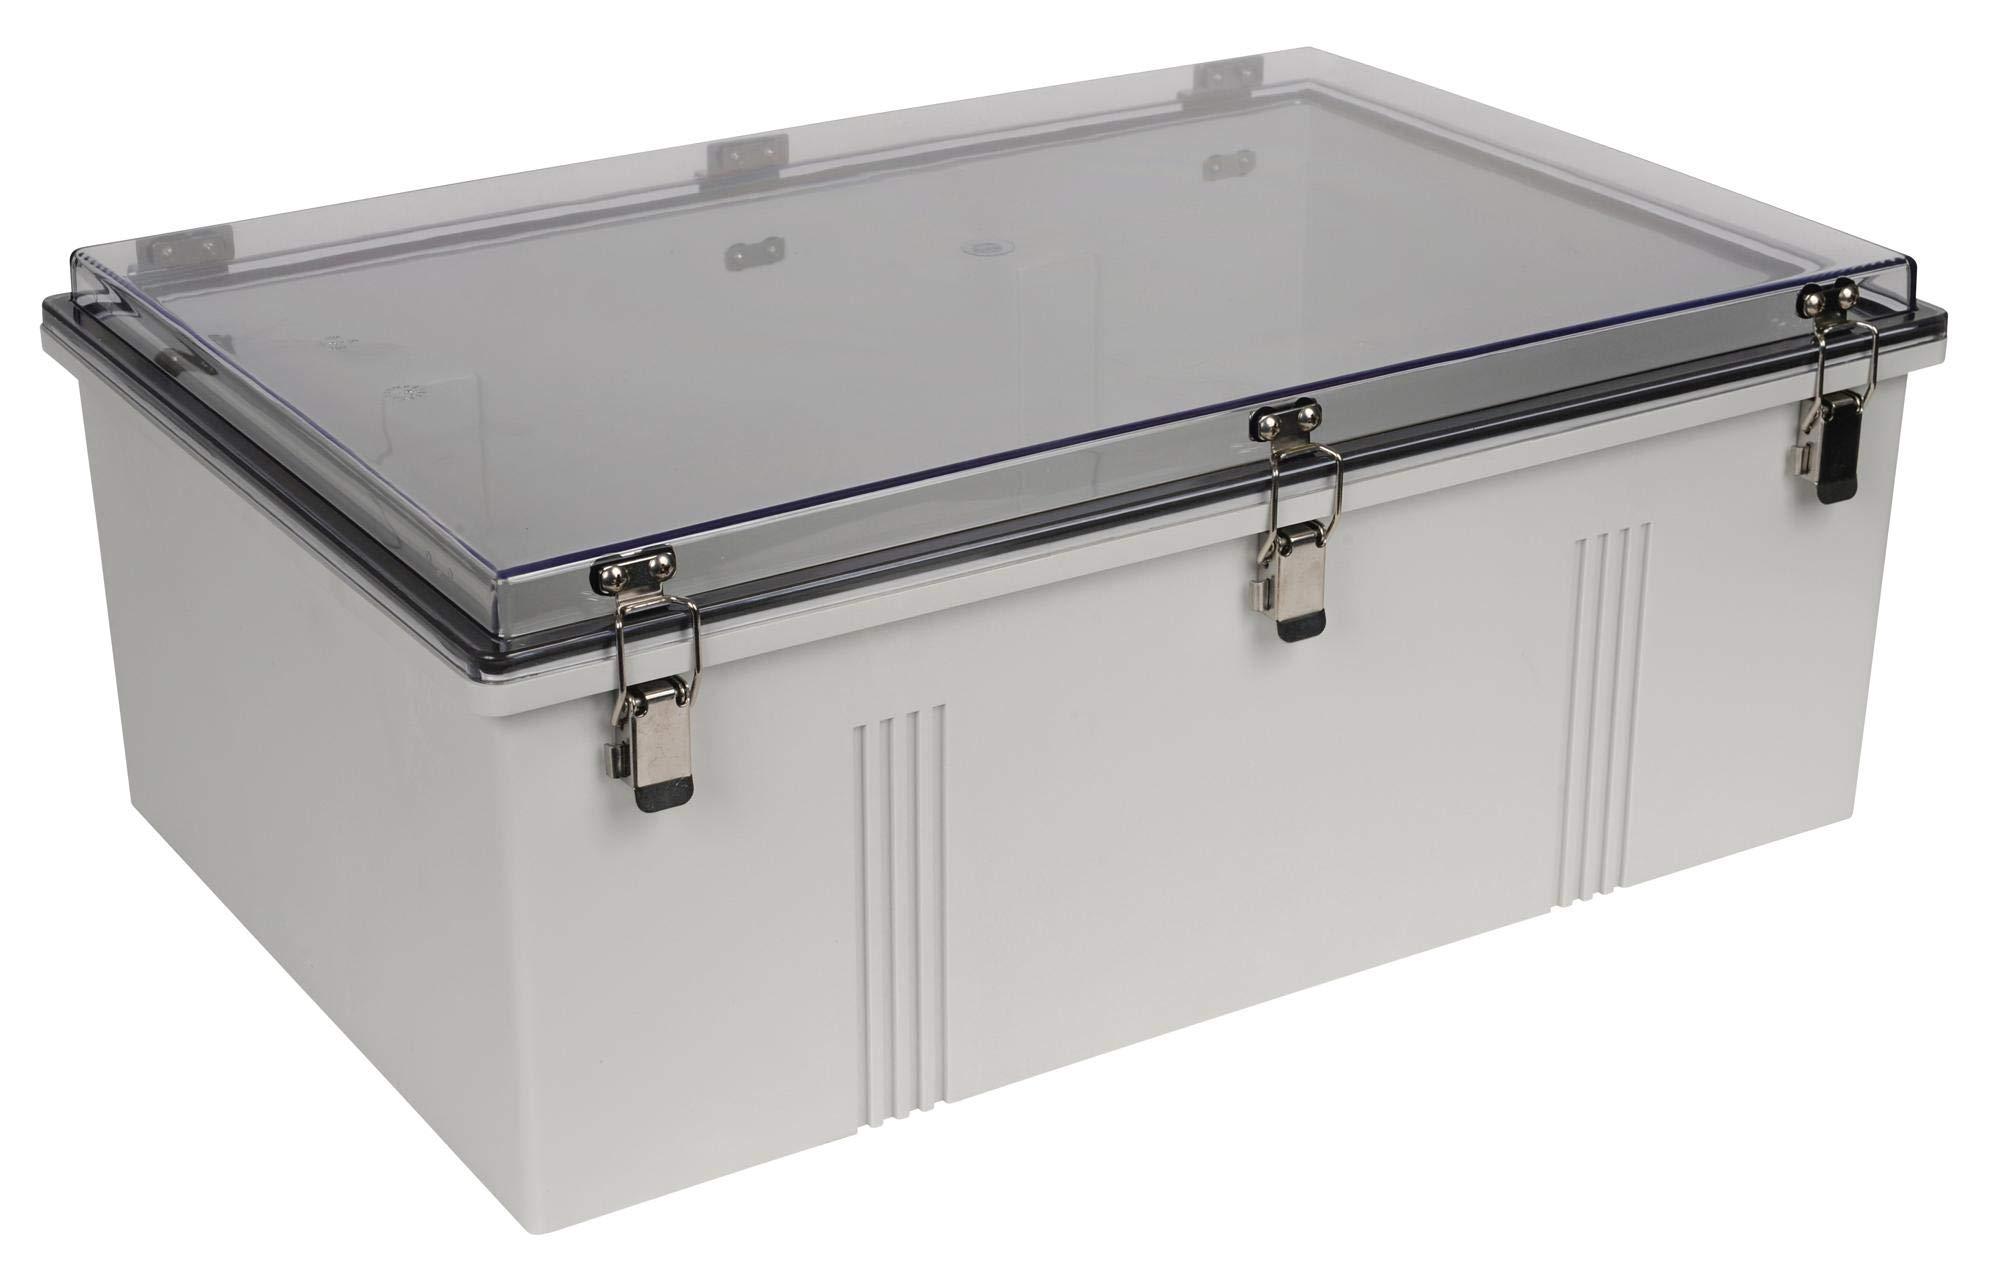 BUD Industries PTH-22440-C Fiberglass Hinged Box, Standard Orientation